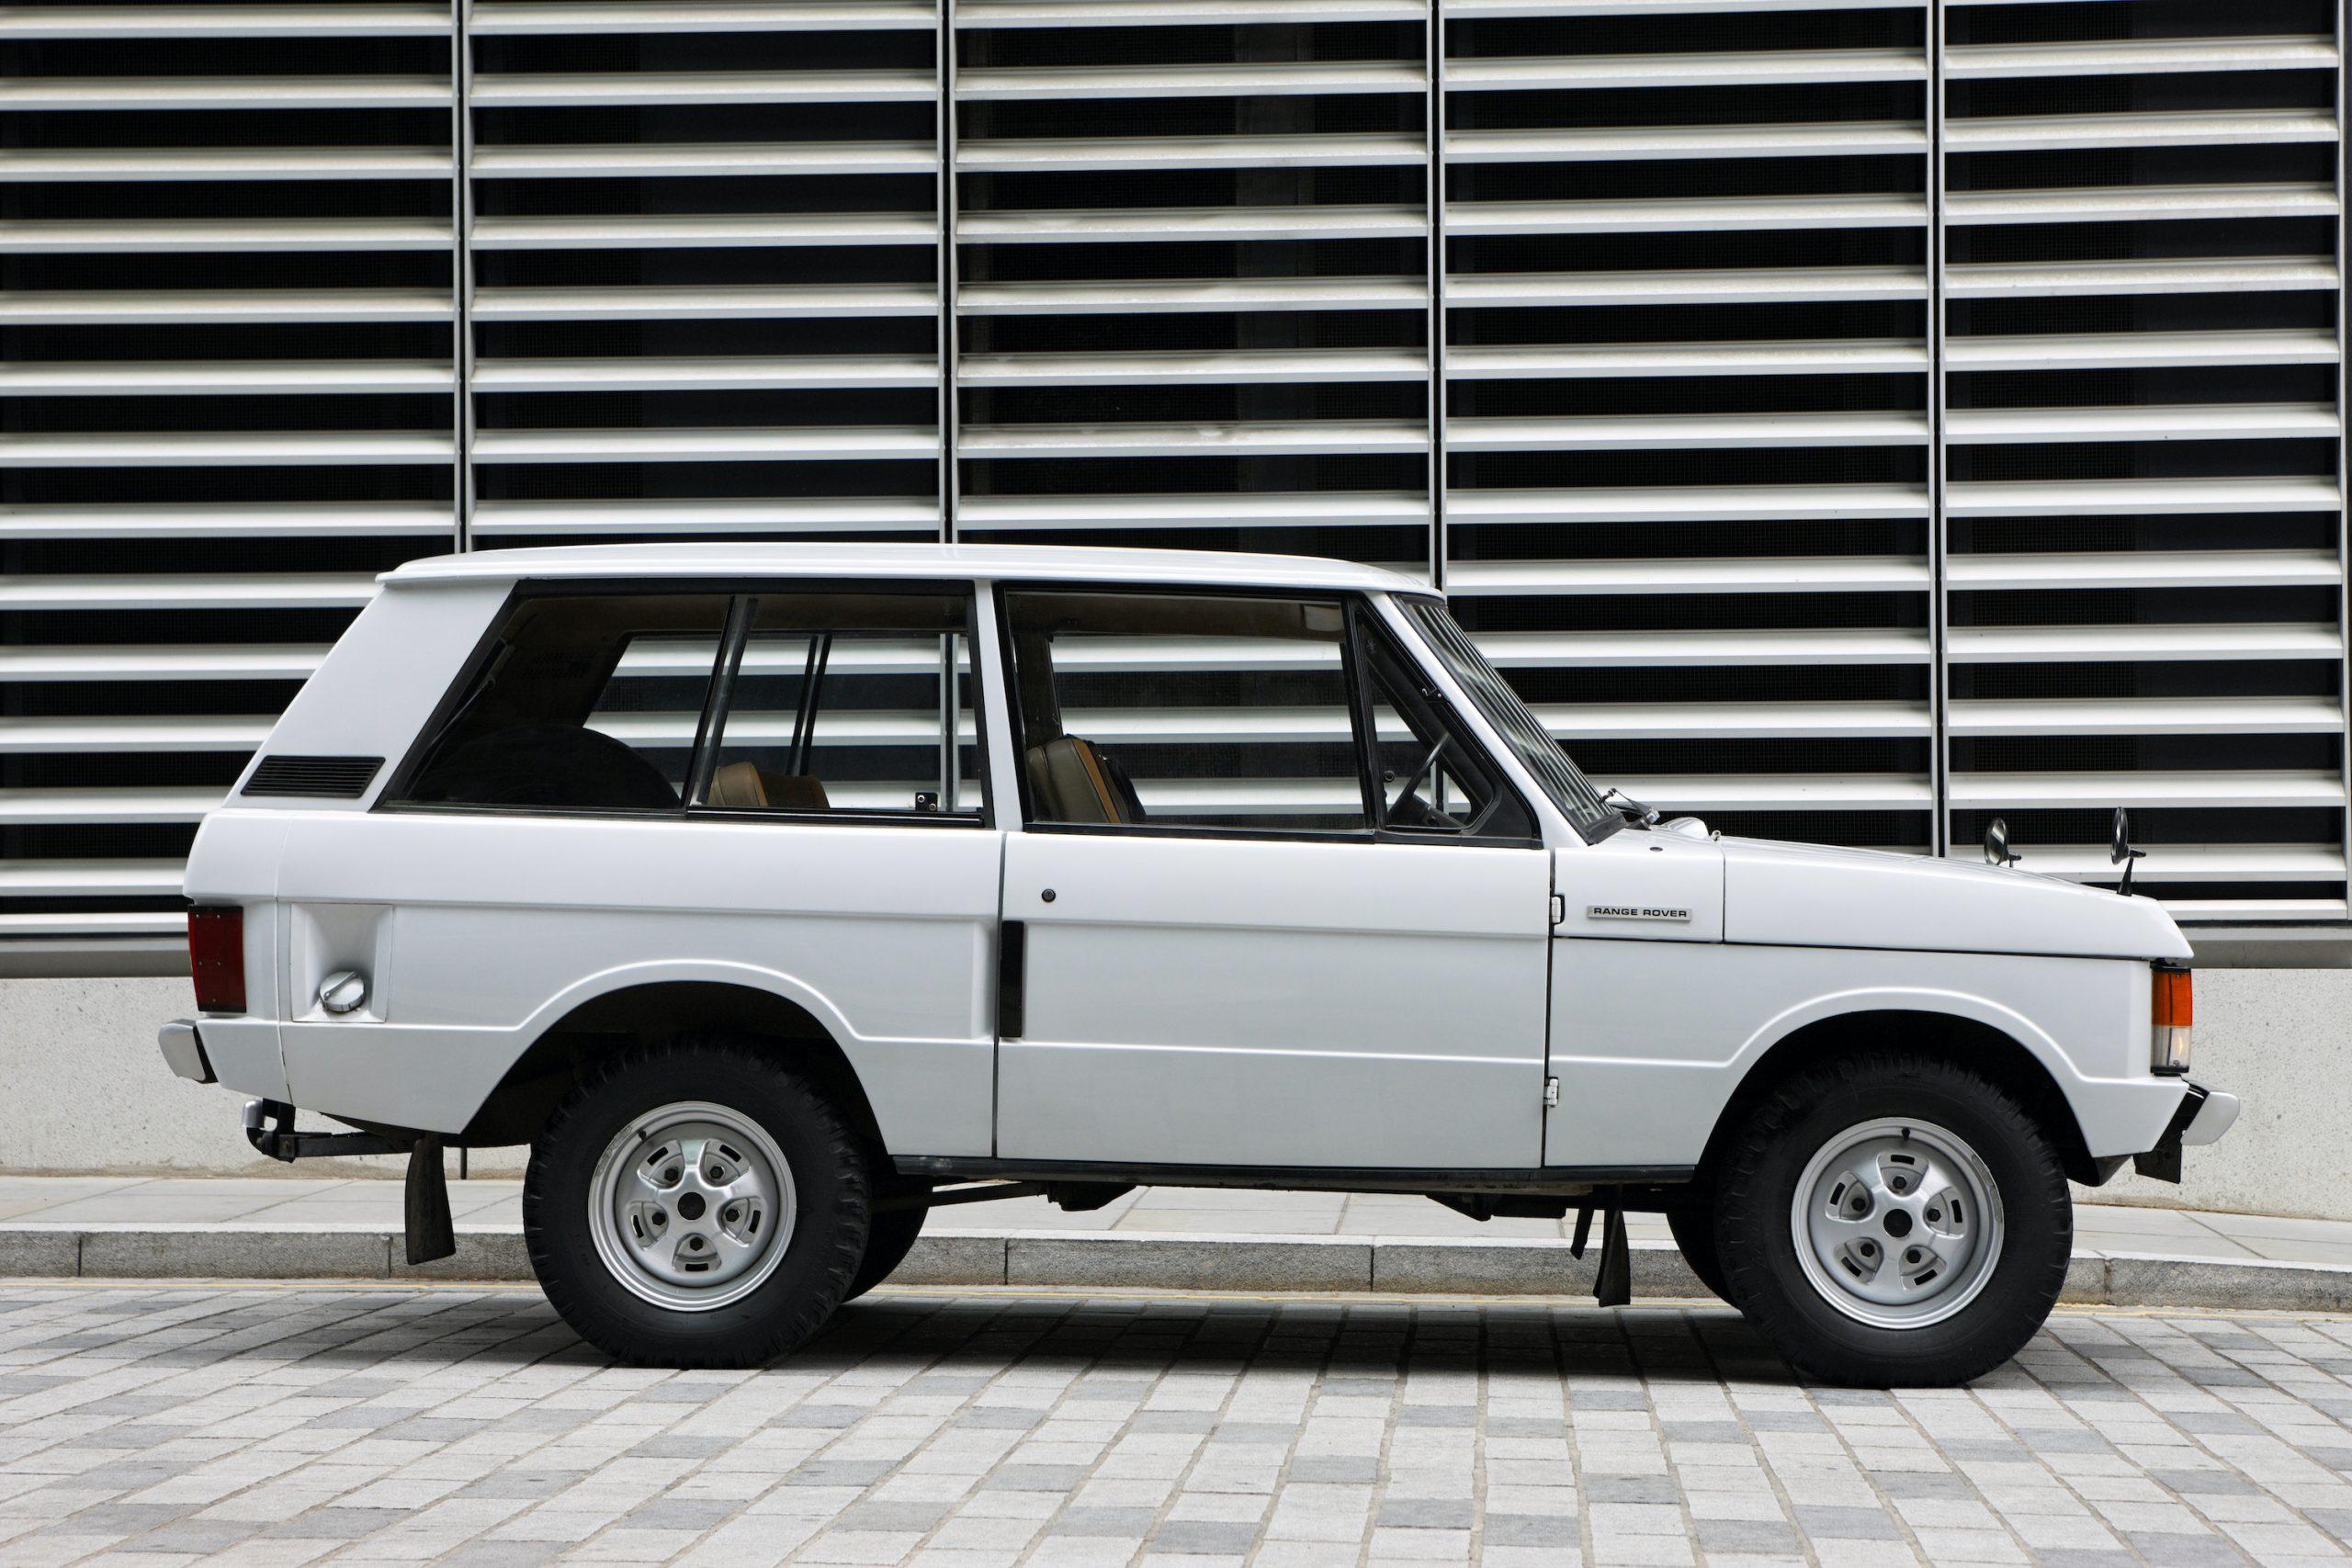 1970 Range Rover Side Profile